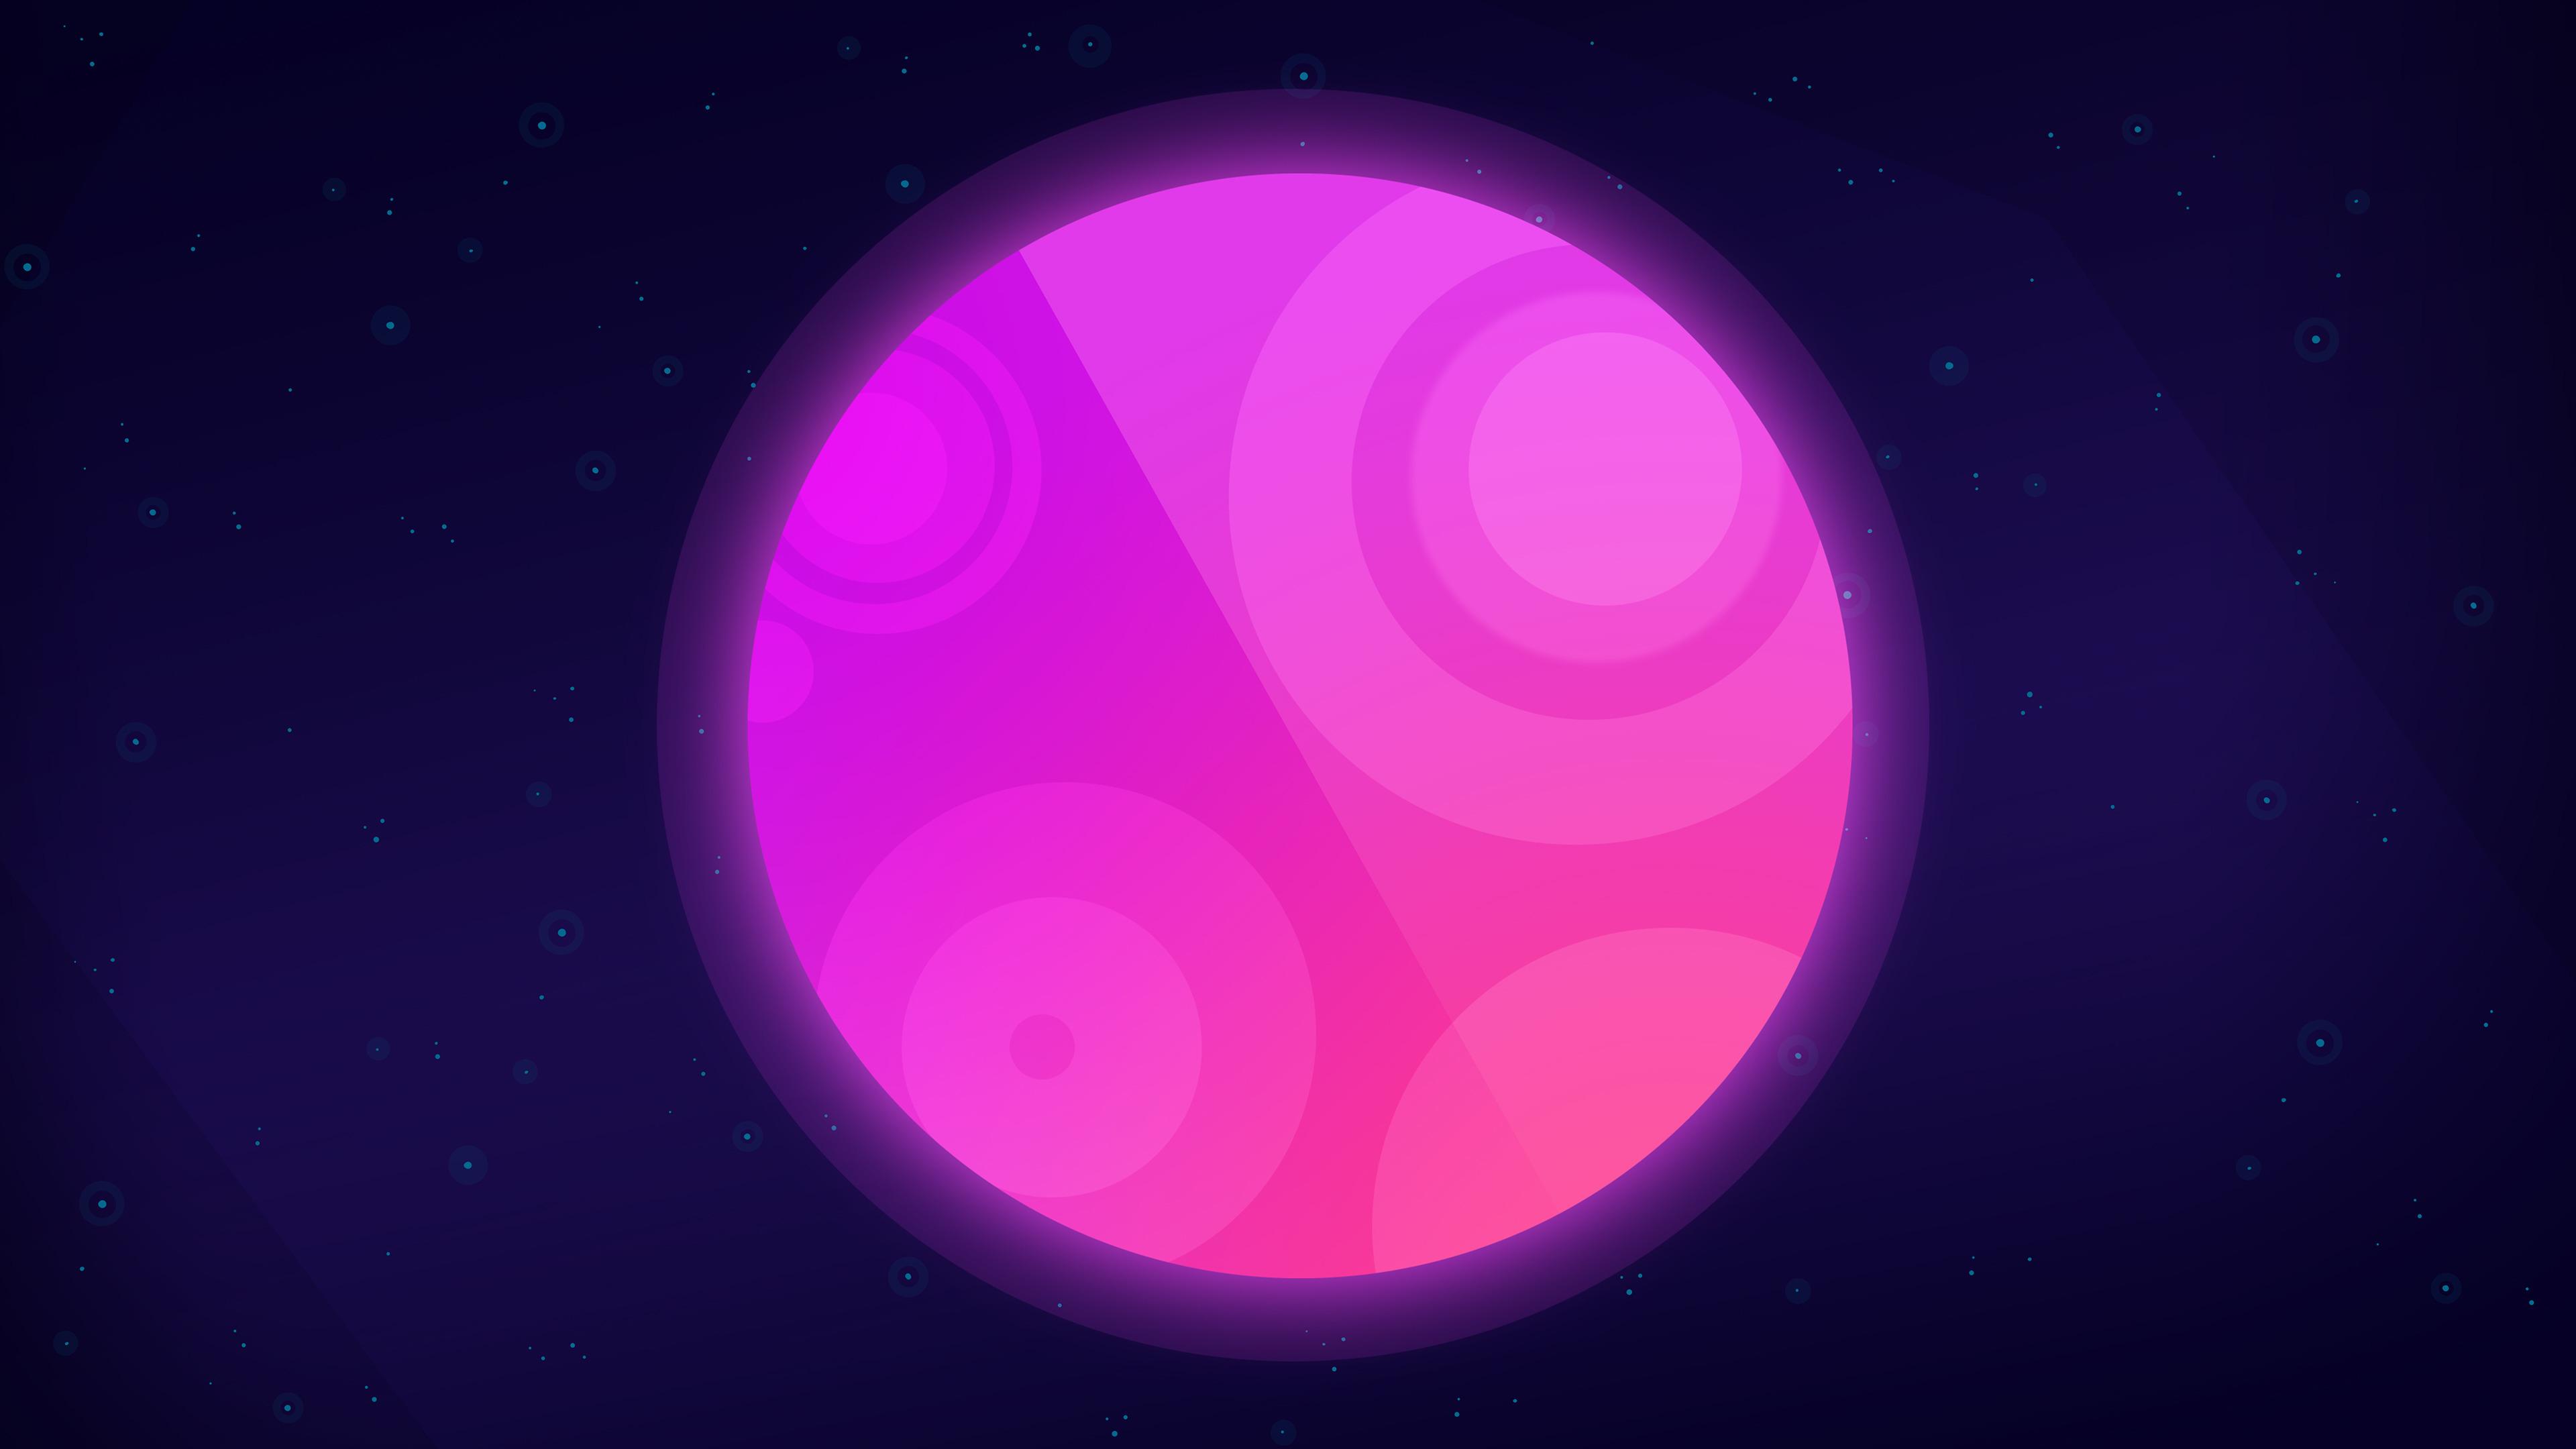 moon neon pink planet 4k